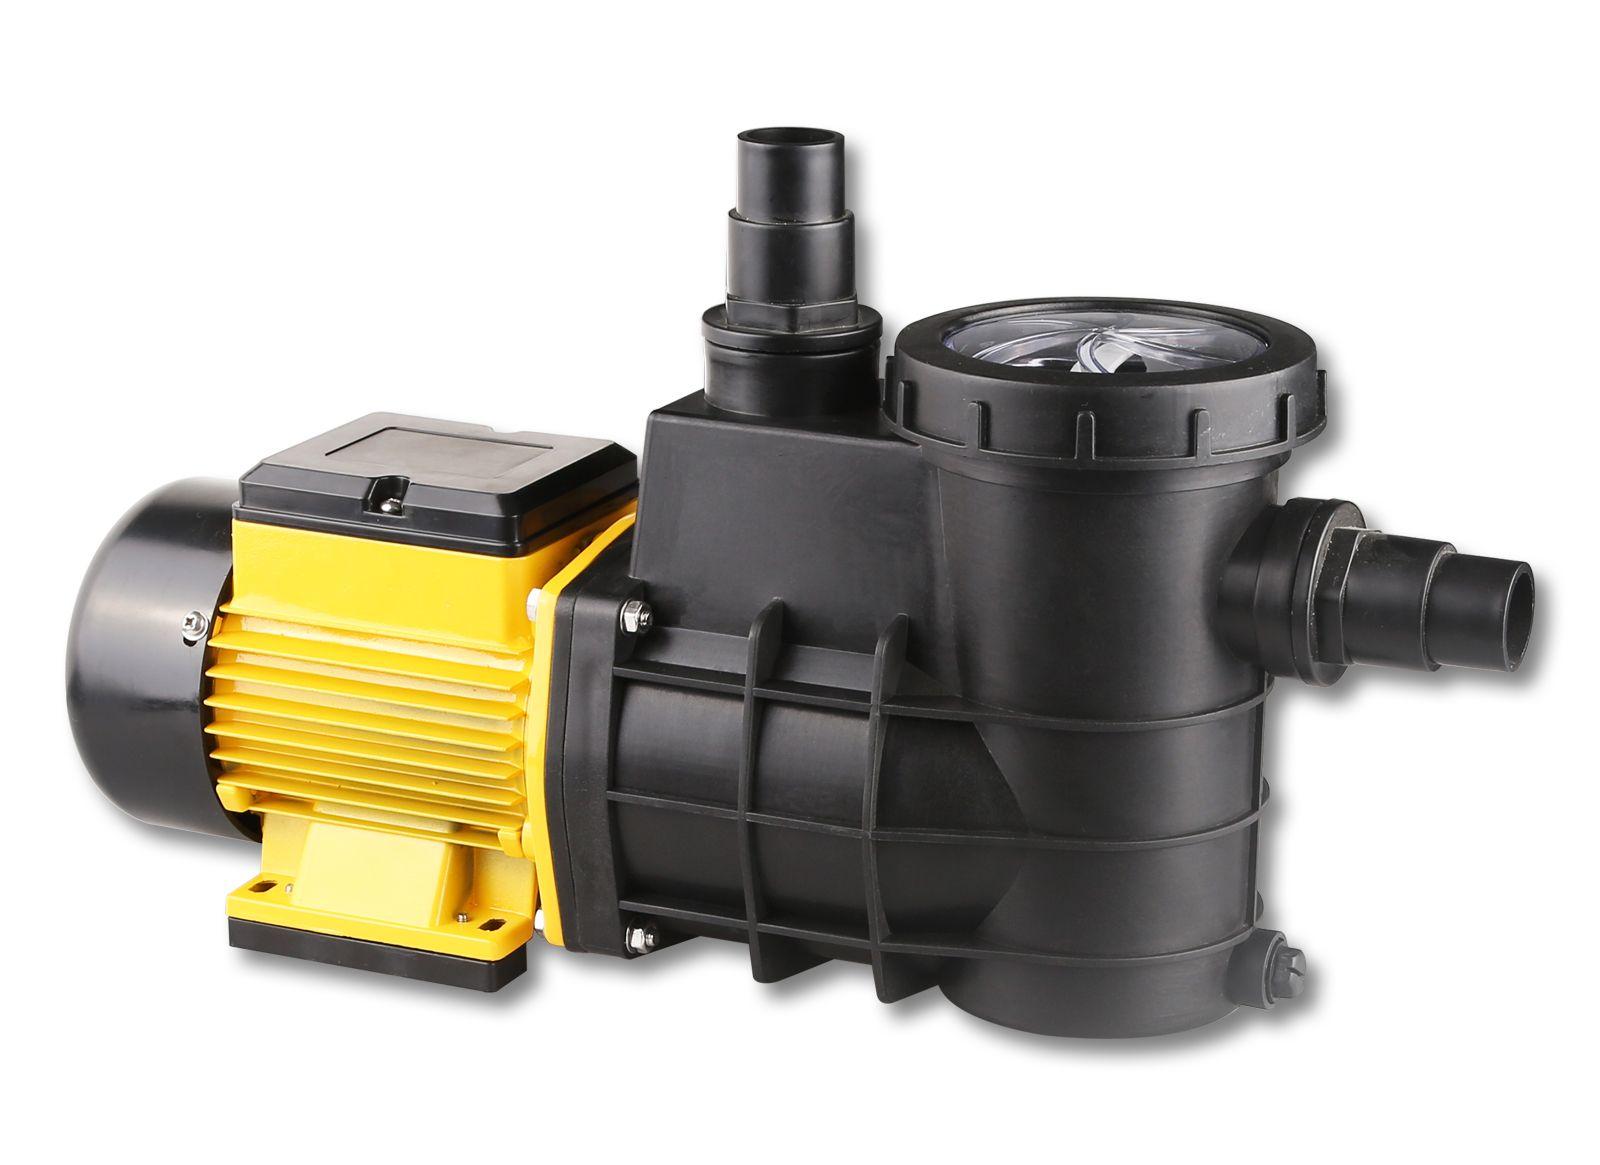 Sunsun pompe de piscine filtre 8000l h 380w pompe de ci for Pompe de piscine